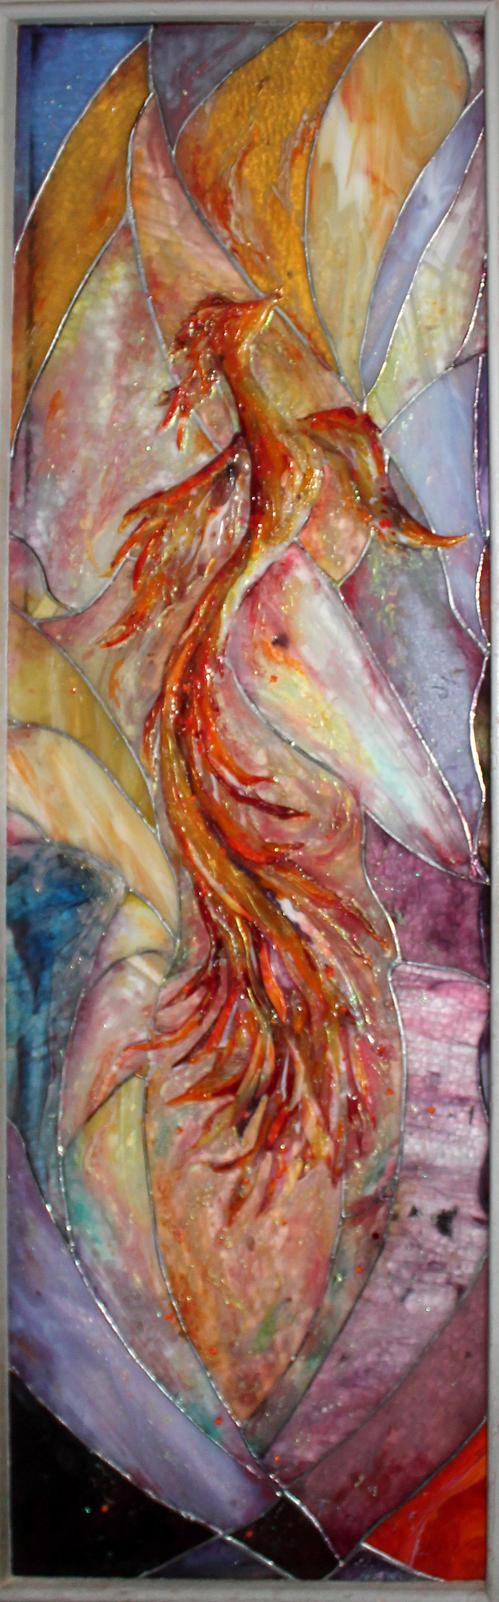 Stained glass Phoenix by Svetlana-Eliro